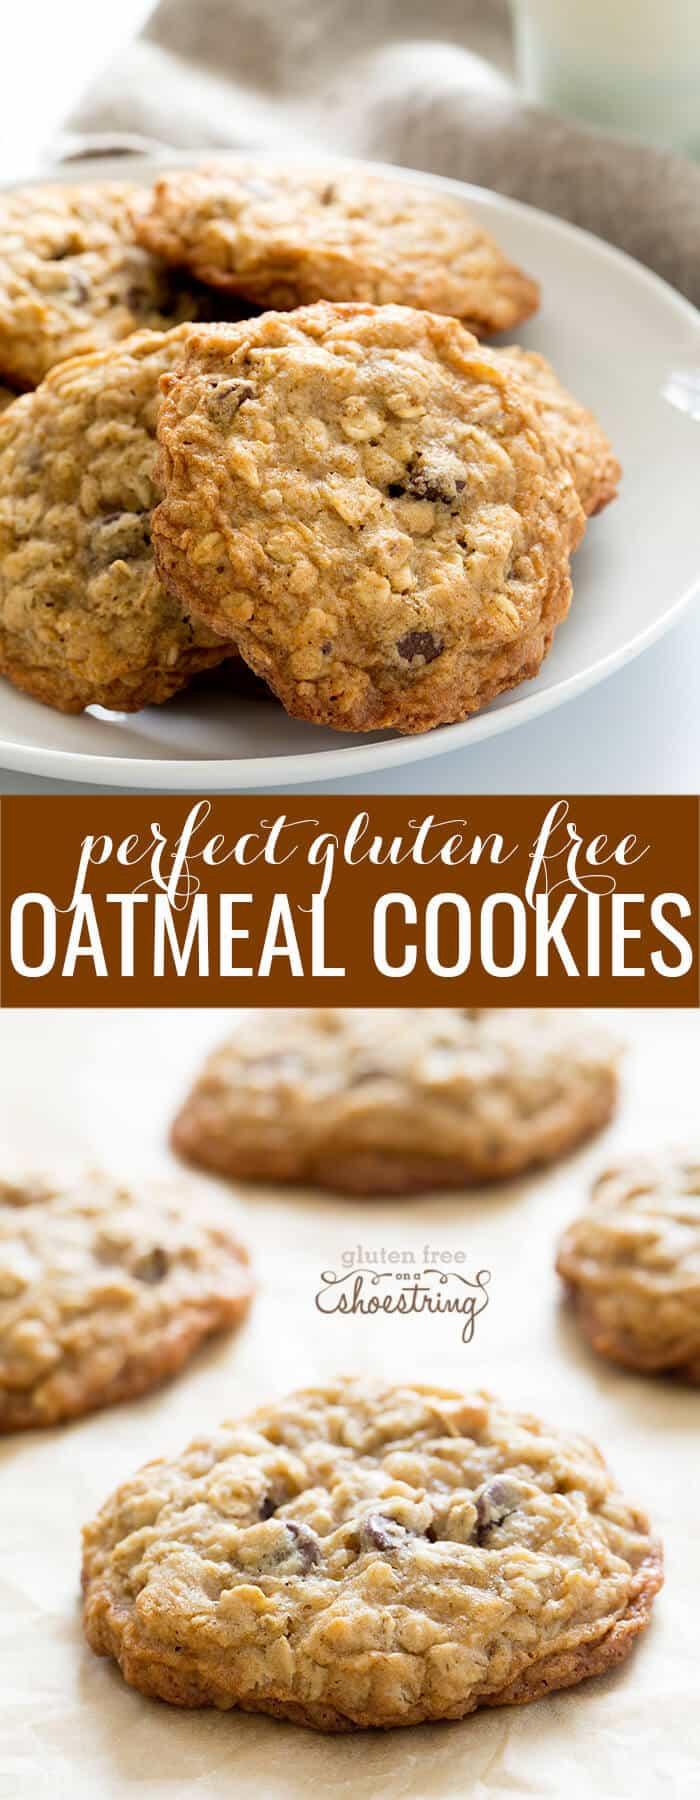 Gluten Free Oatmeal Cookies  Gluten Free Oatmeal Cookies